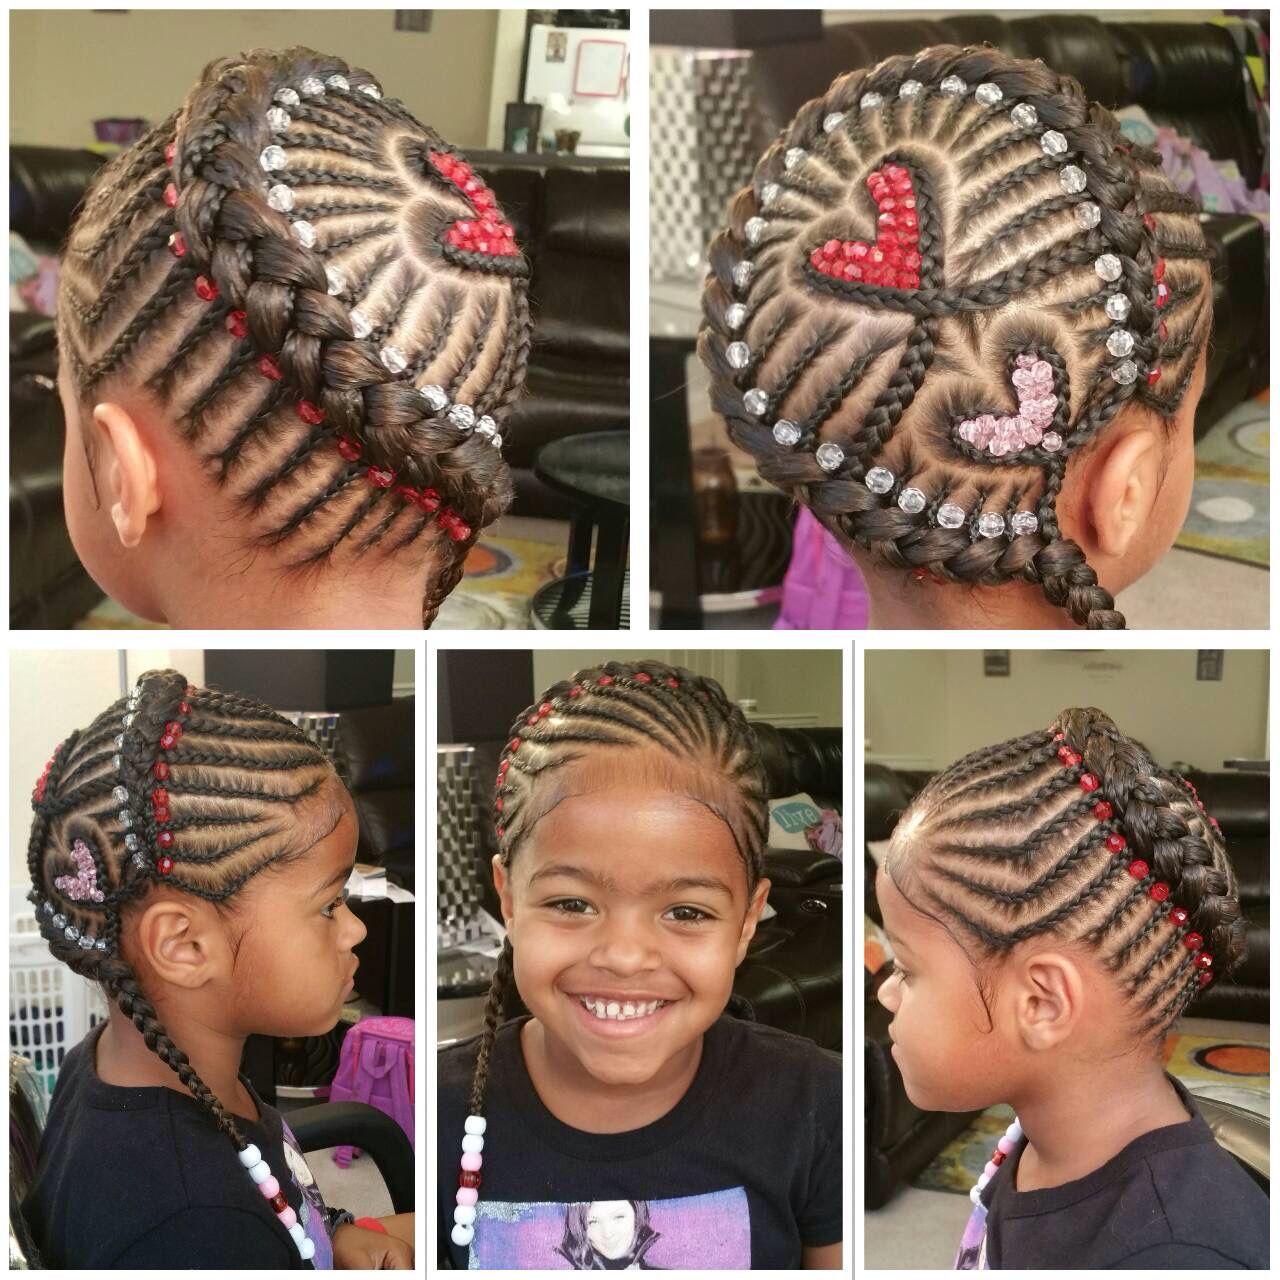 Kid hairstyles with beads kid hairstyles pinterest beautiful - Kid Braid Styles Heart Braid With Beads Sexy Hairstylesbeautiful